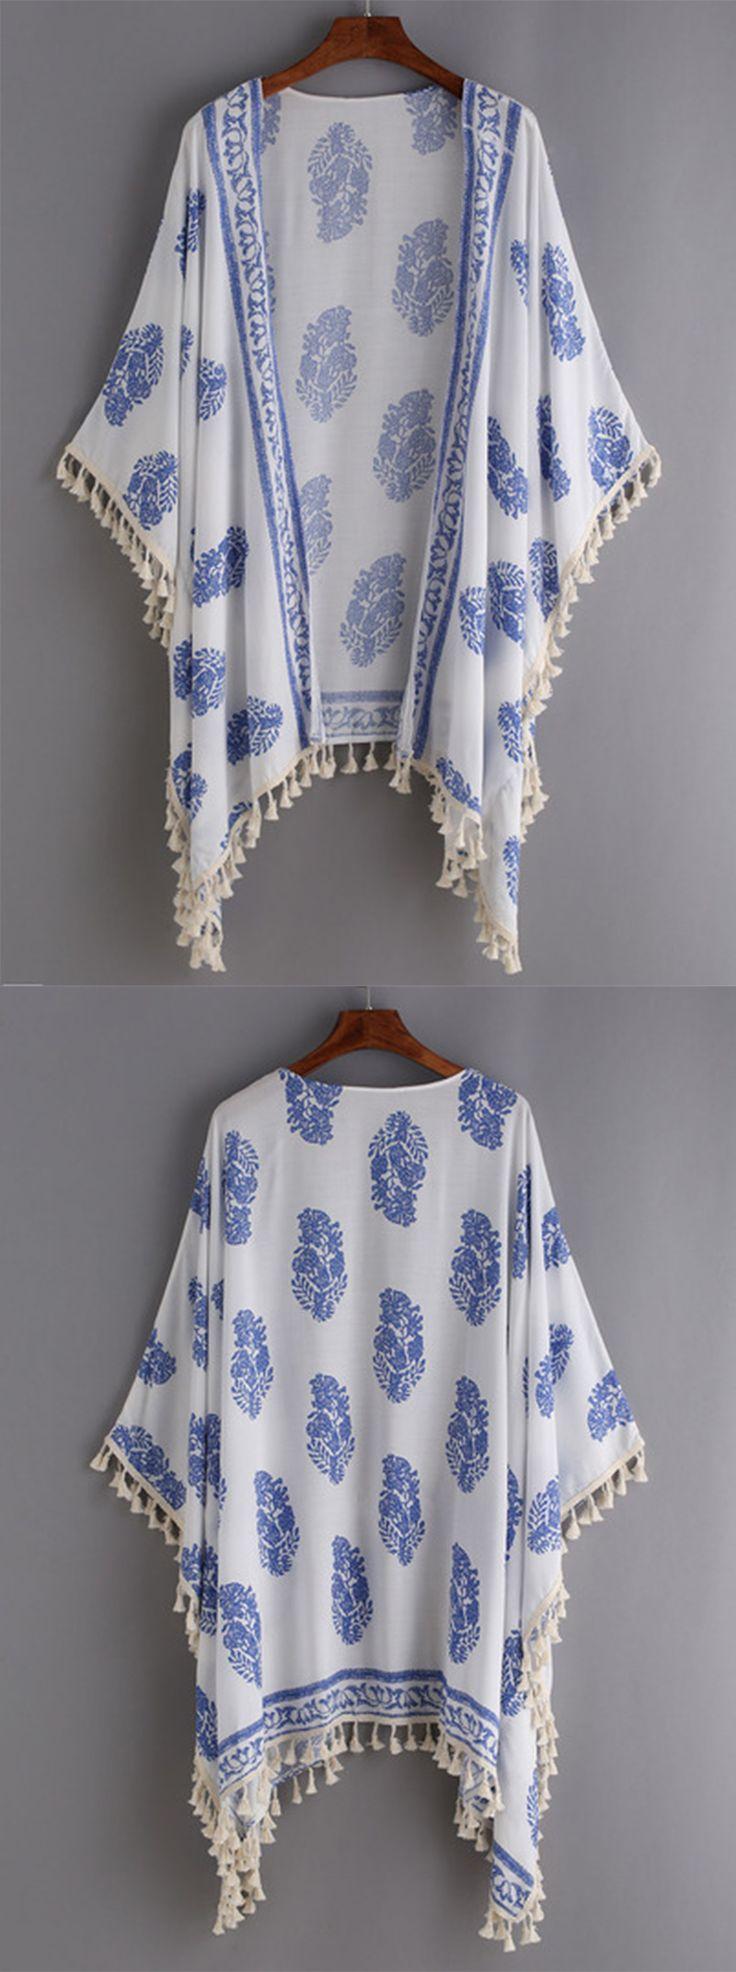 Beach Style - Tassel Trimmed Printed Kimono - romwe.com                                                                                                                                                                                 More